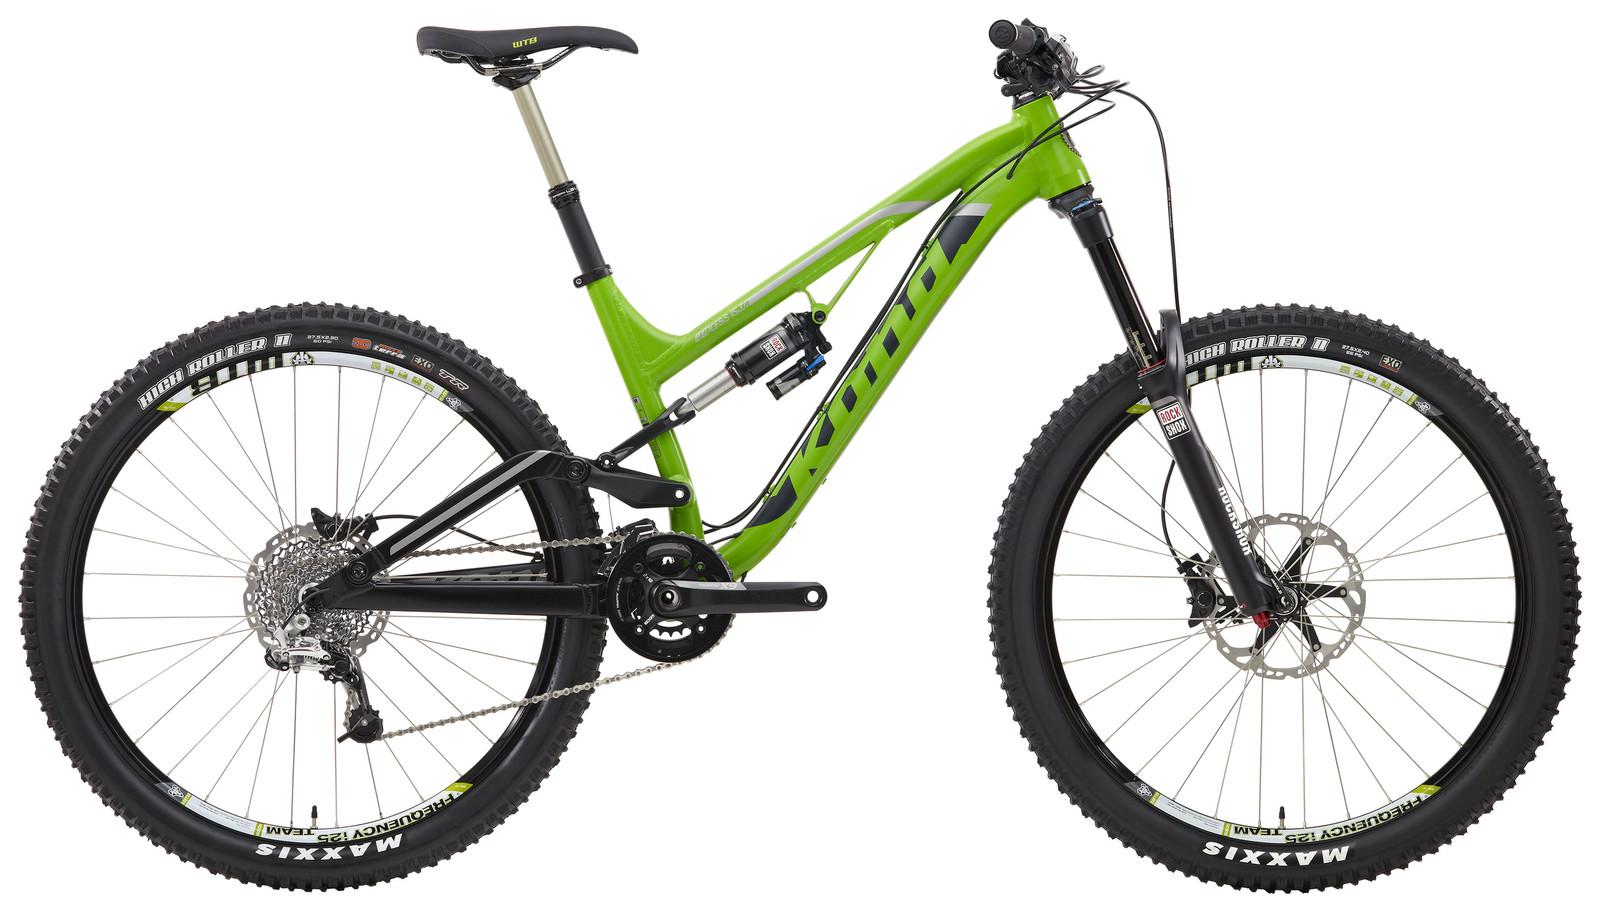 First Look: Kona's 2014 Process Lineup - One Platform, Three Bikes, Six Models - First Look: Kona's 2014 Process Lineup - Mountain Biking Pictures - Vital MTB